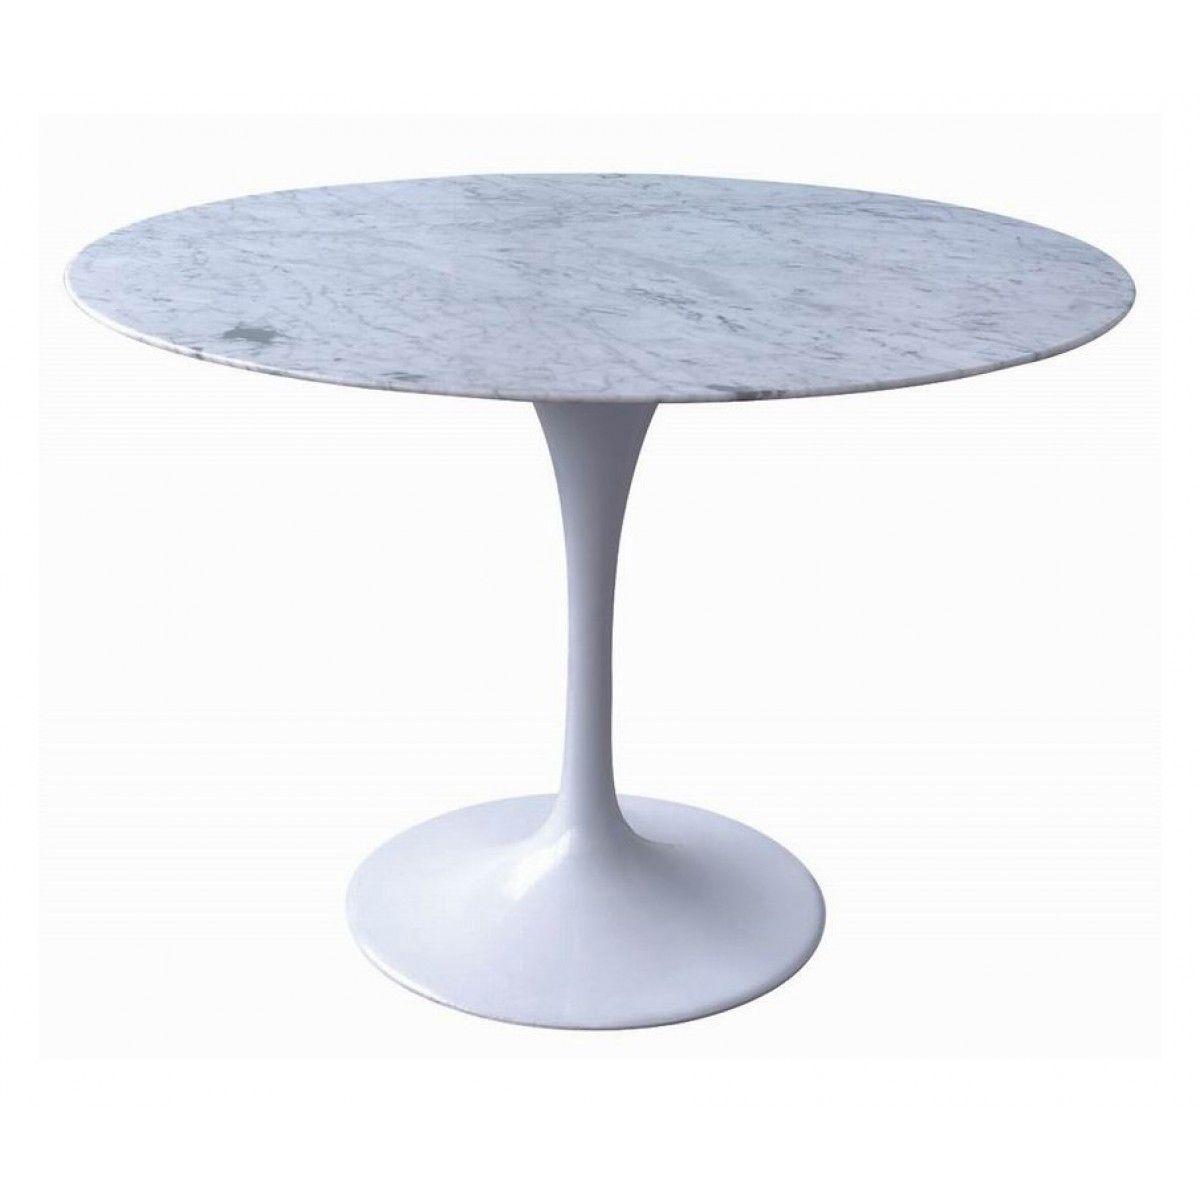 Great Tulip Marble Dining Table 100cm   Eero Saarinen Replica   Marble Top    Aluminium   Dining